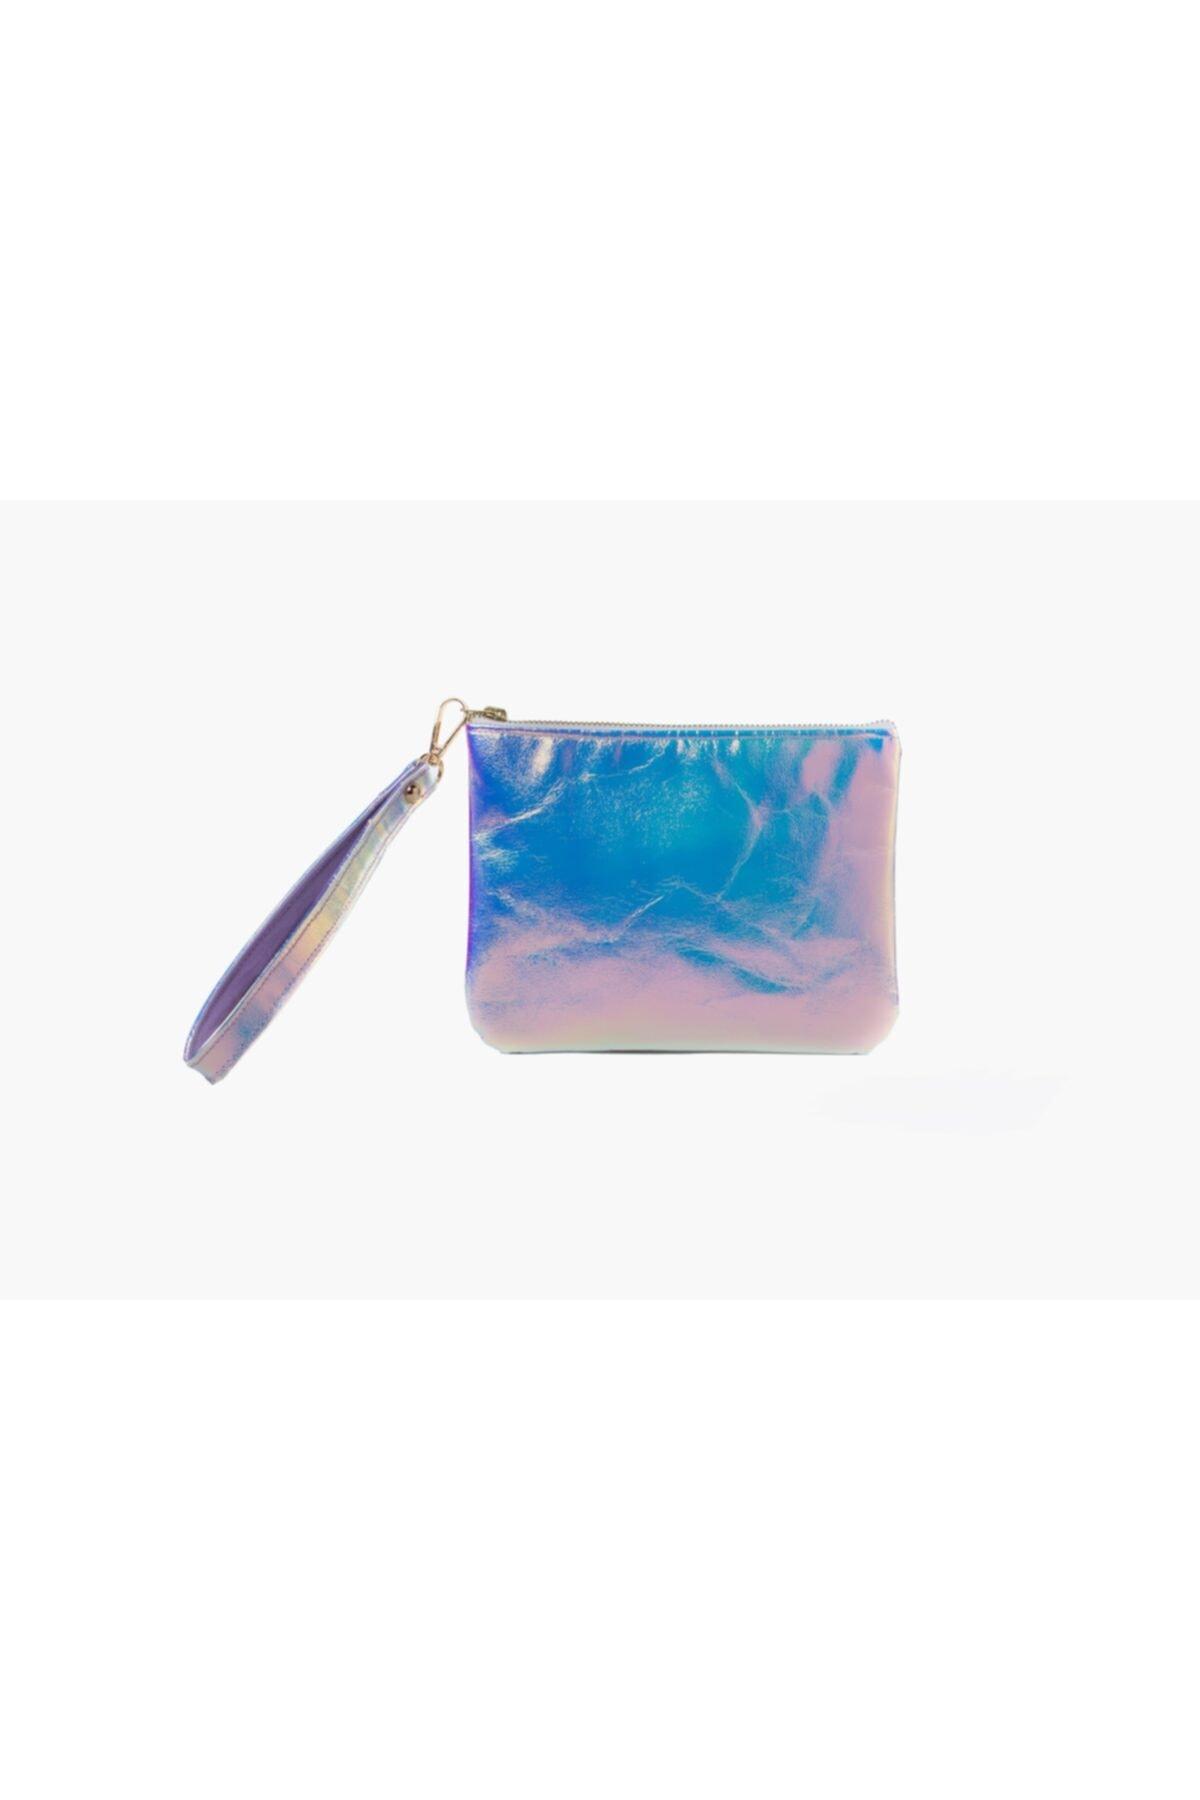 خرید کیف دستی خفن برند celmonster رنگ آبی کد ty99488582